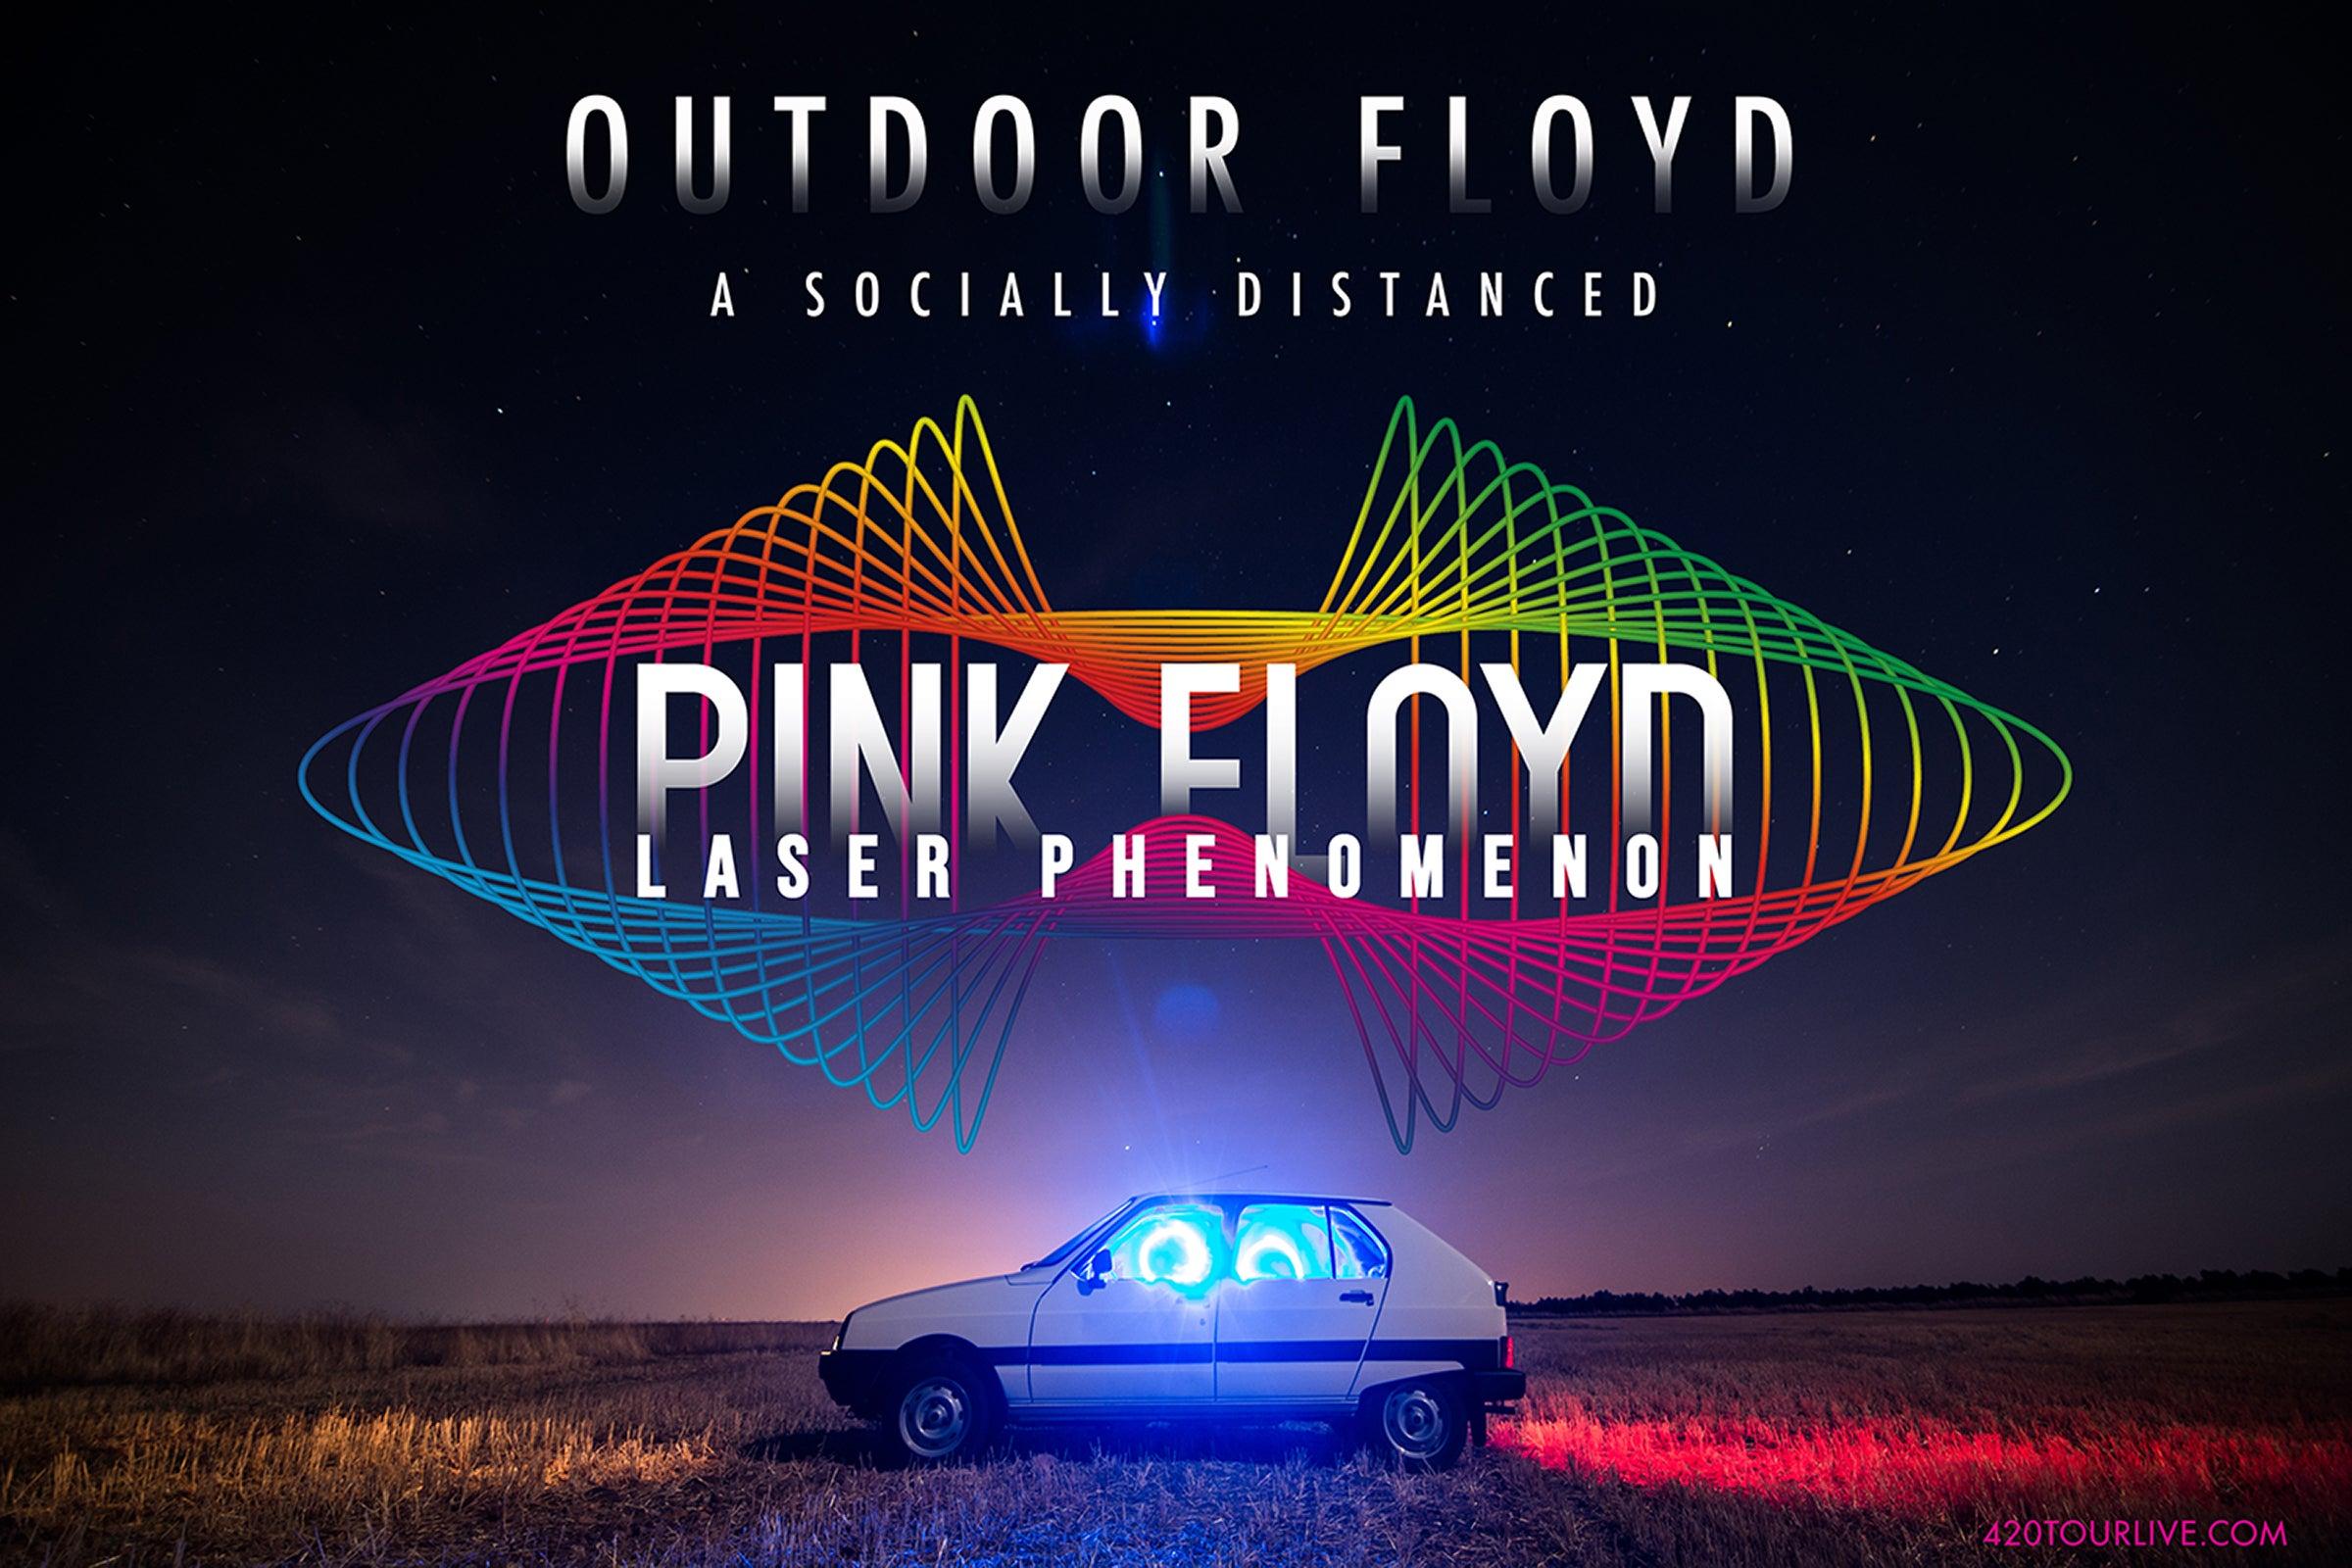 Outdoor Floyd: Pink Floyd Laser Phenomenon